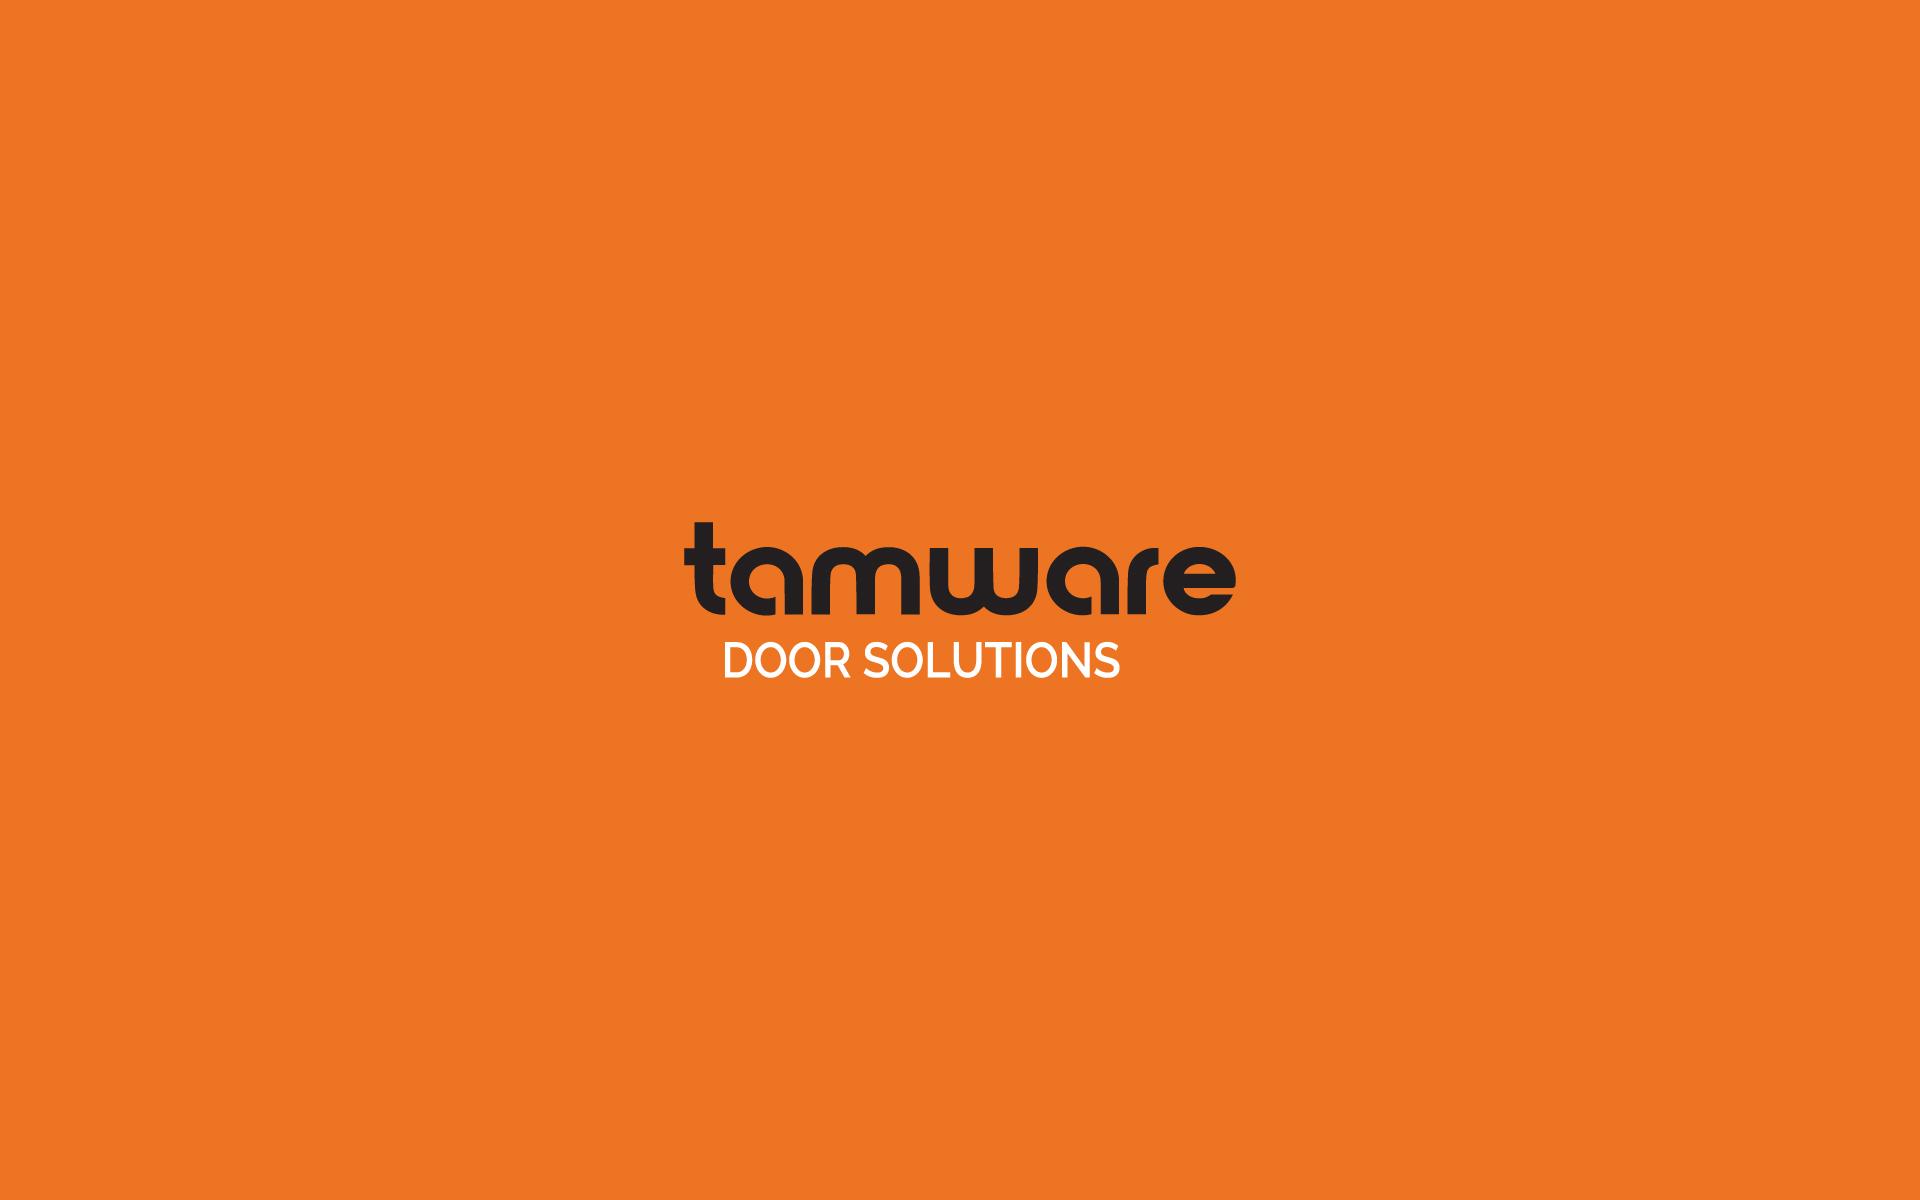 tamware_header_04